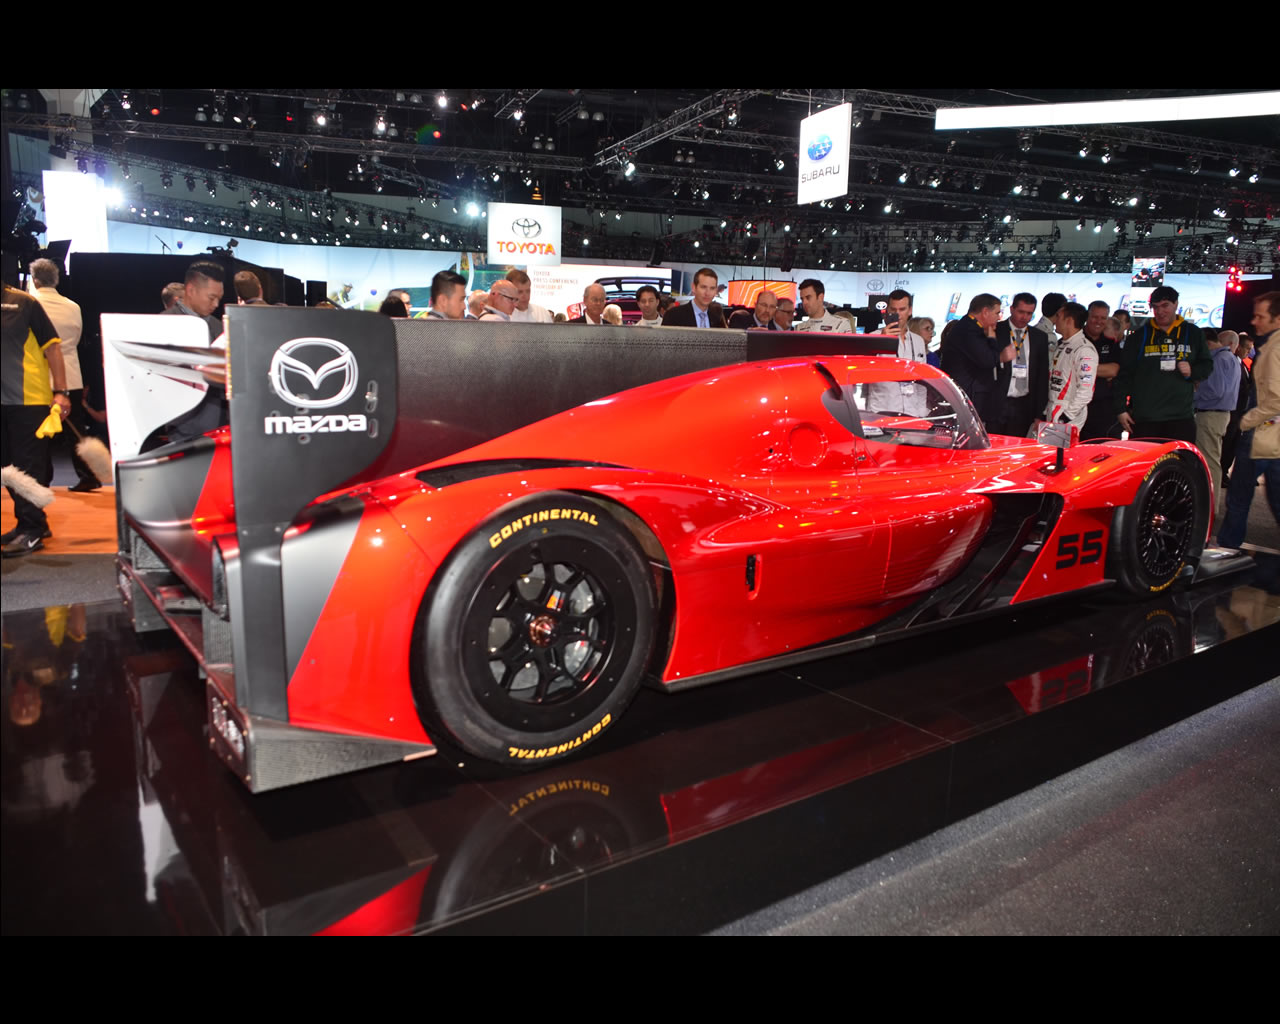 http://autoconcept-reviews.com/cars_reviews/mazda/mazda-rt24-p-imsa-dpi-race-car-for-2017/wallpaper/3%20-Mazda%20RT24-P%20race%20car.jpg